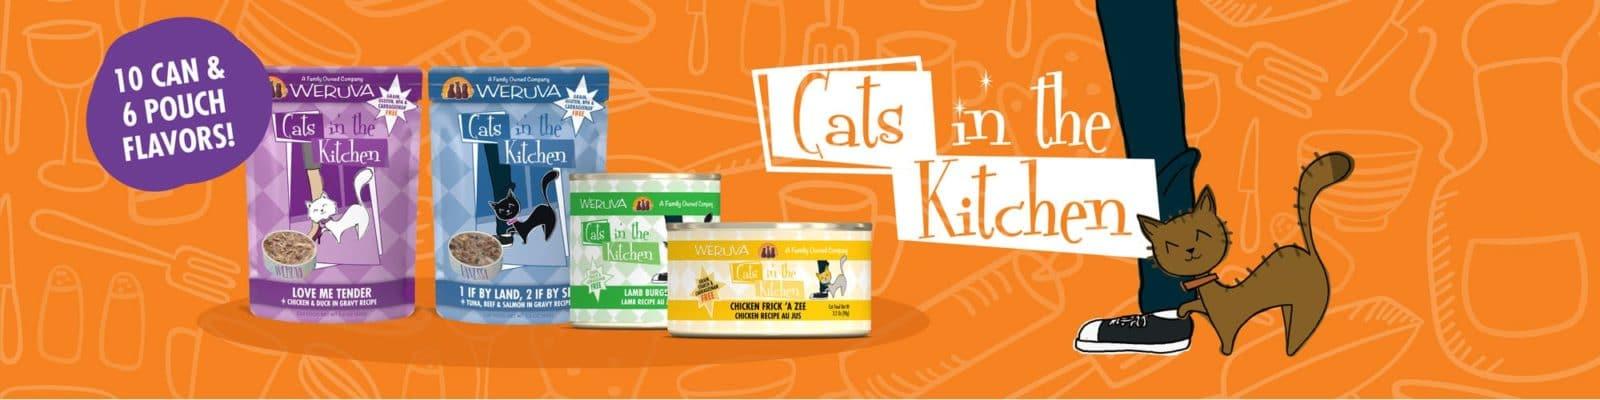 WERUVA CATS IN THE KITCHEN BUY 3 GET 1 FREE!!!